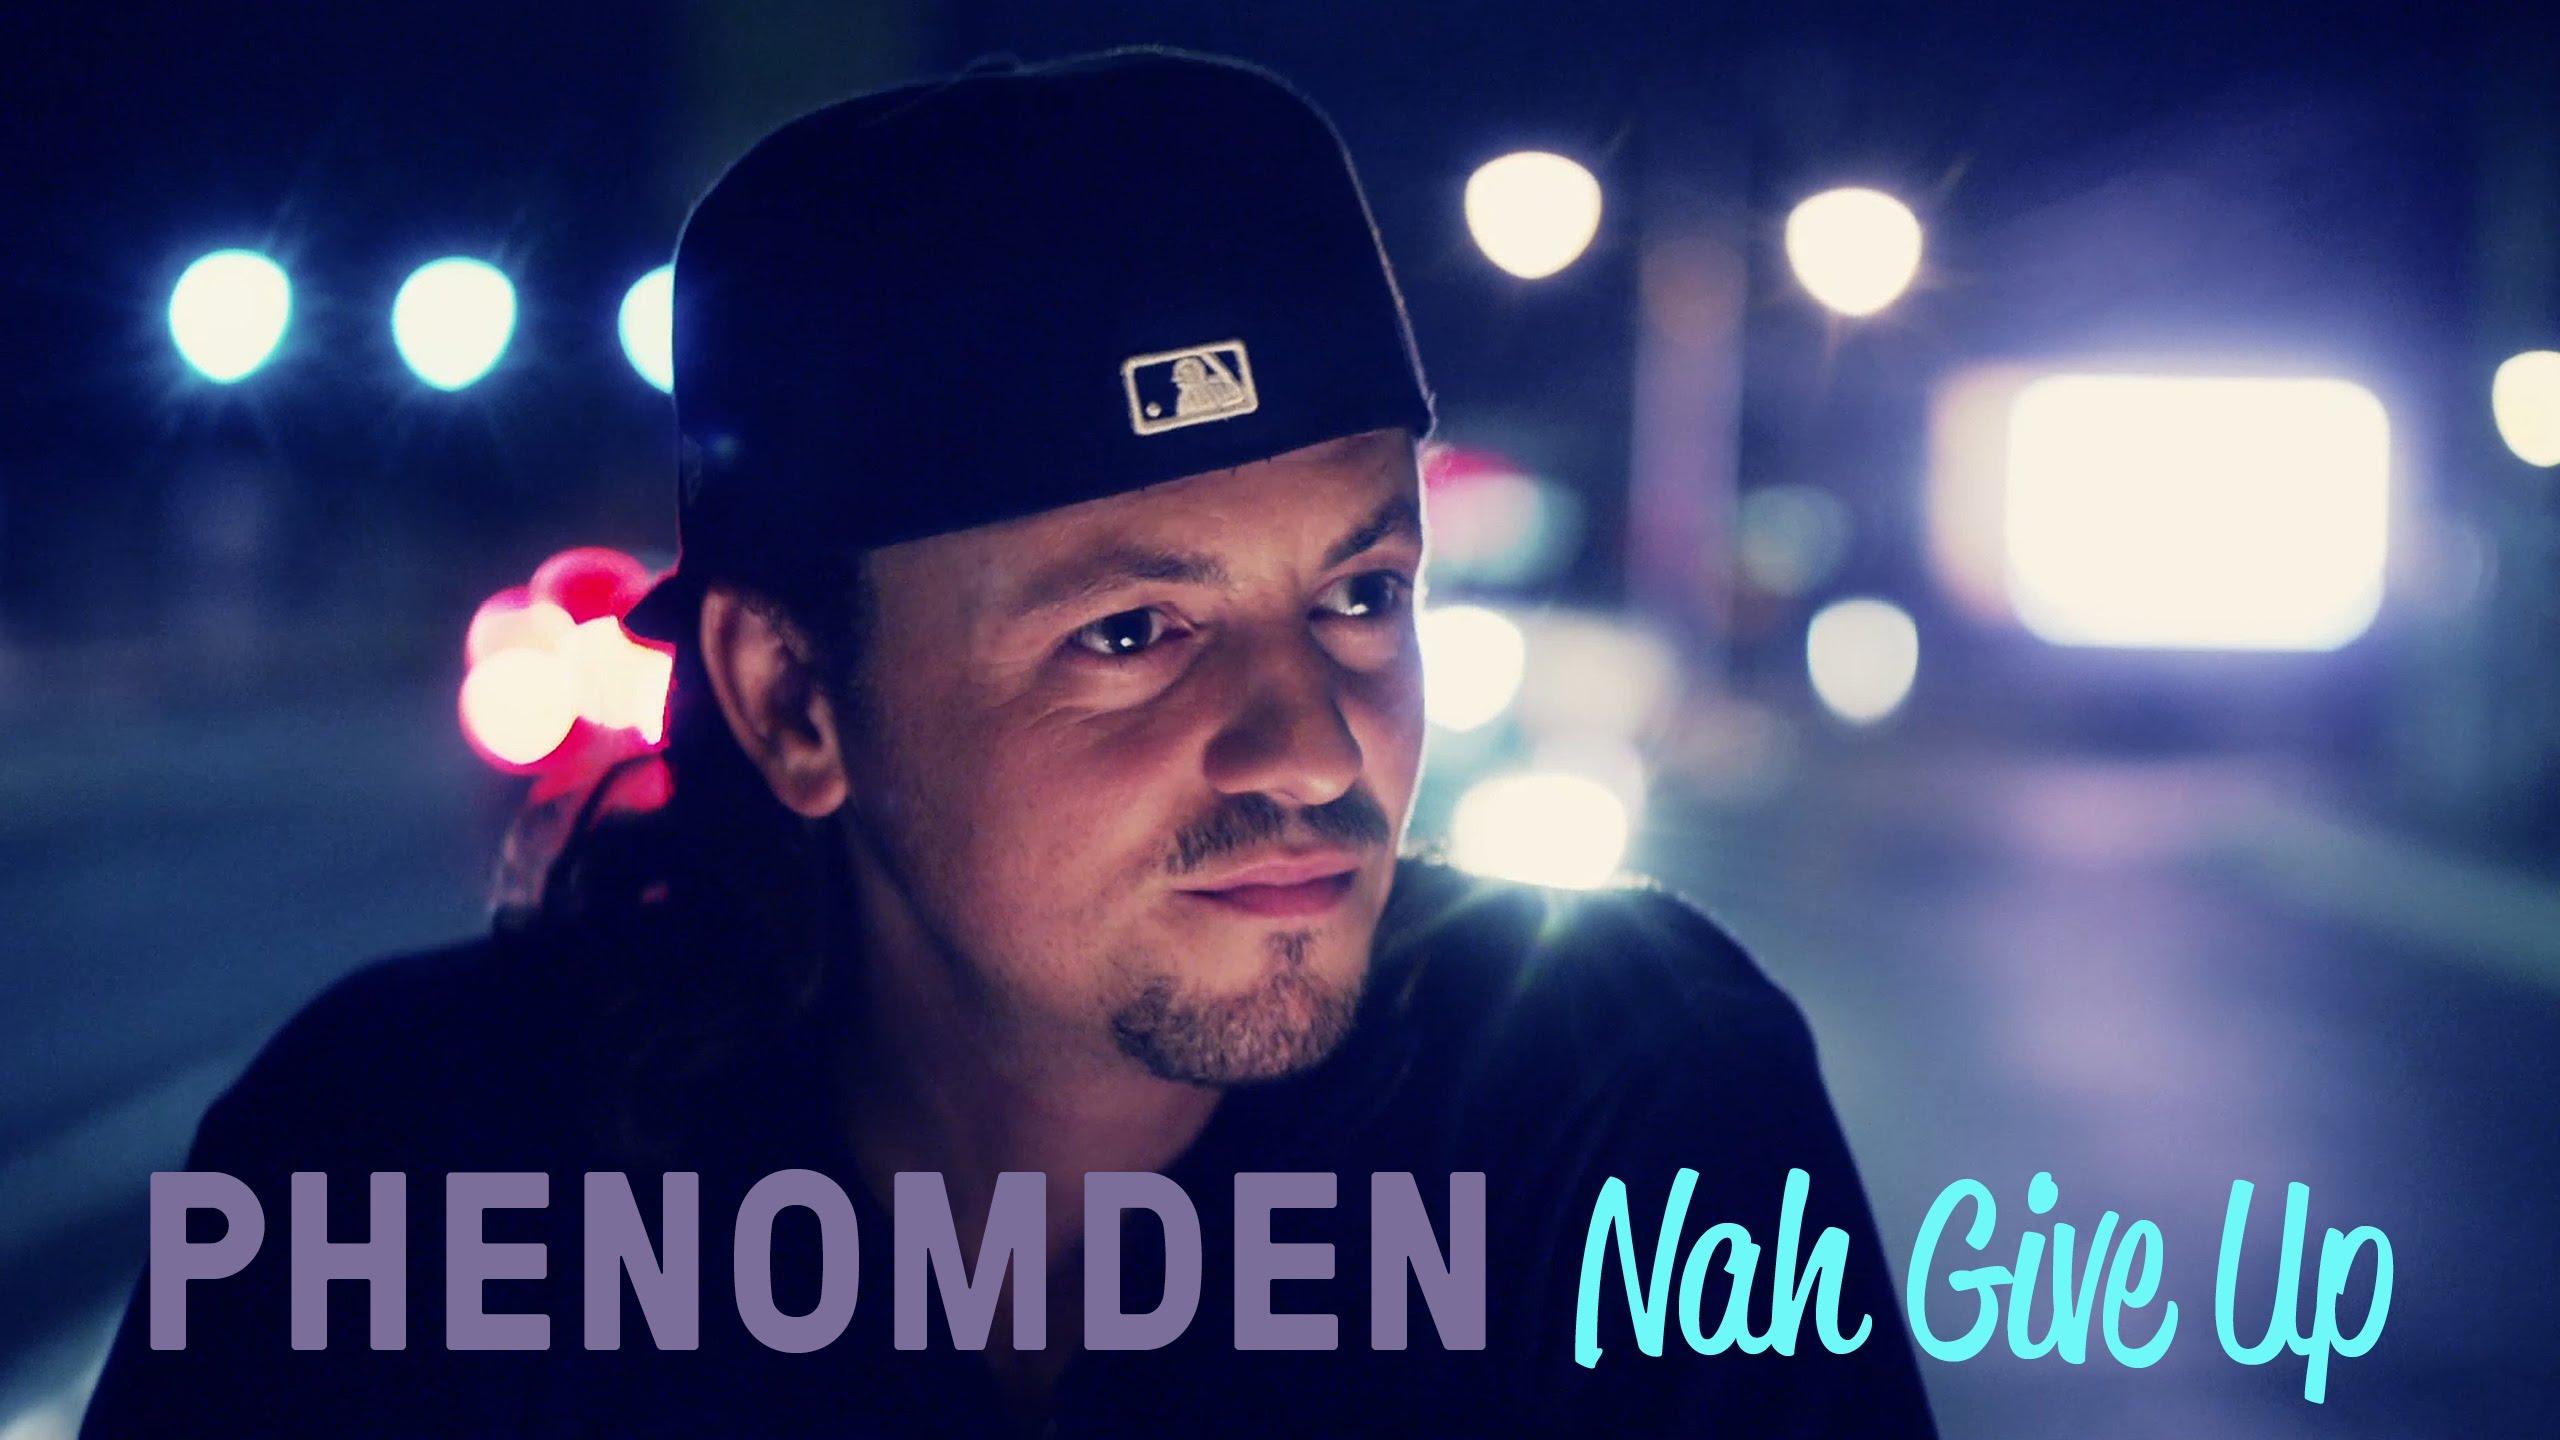 Phenomden - Nah Give Up [3/2/2016]